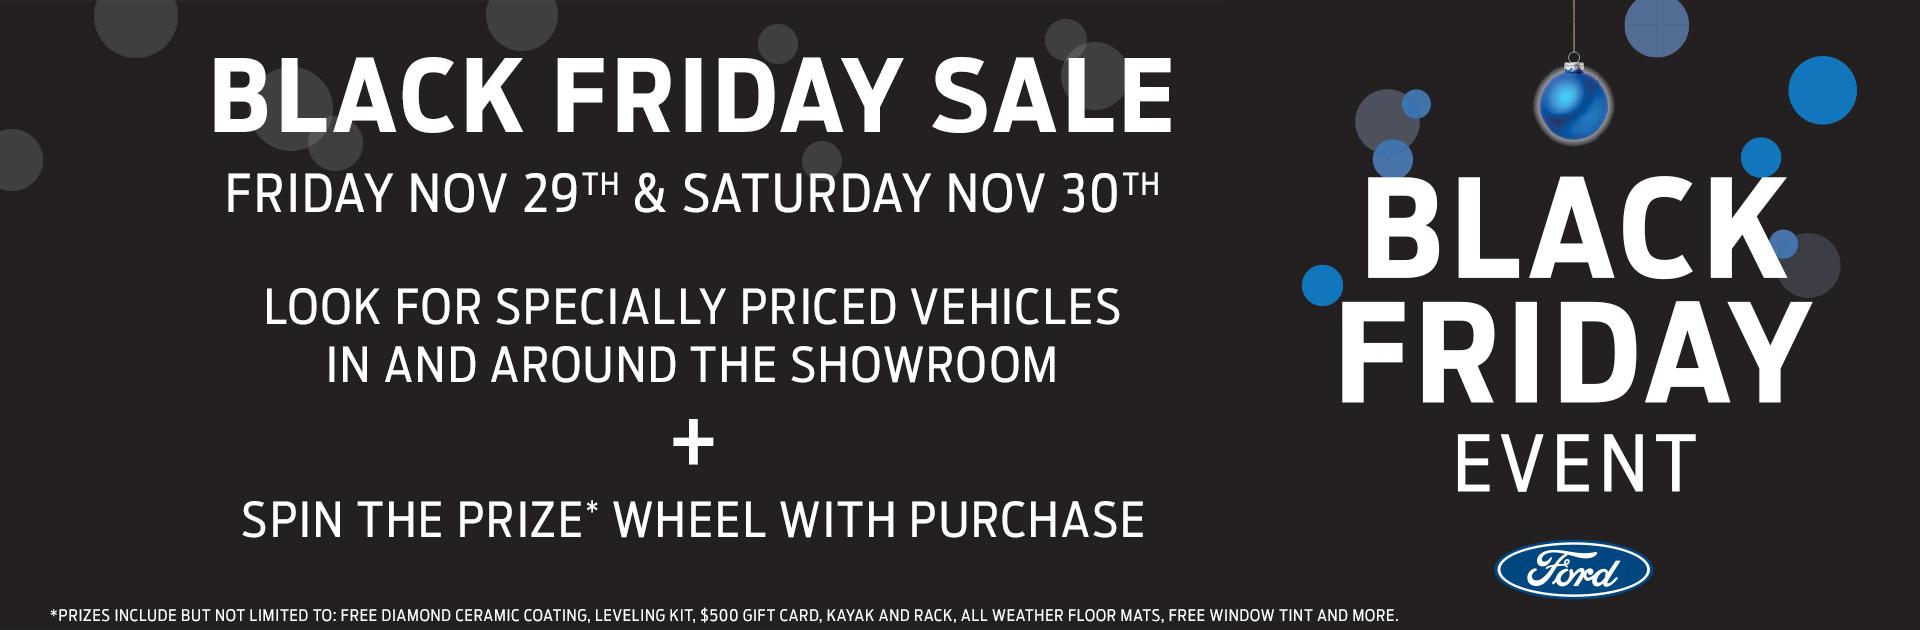 Black Friday Sale Event 11